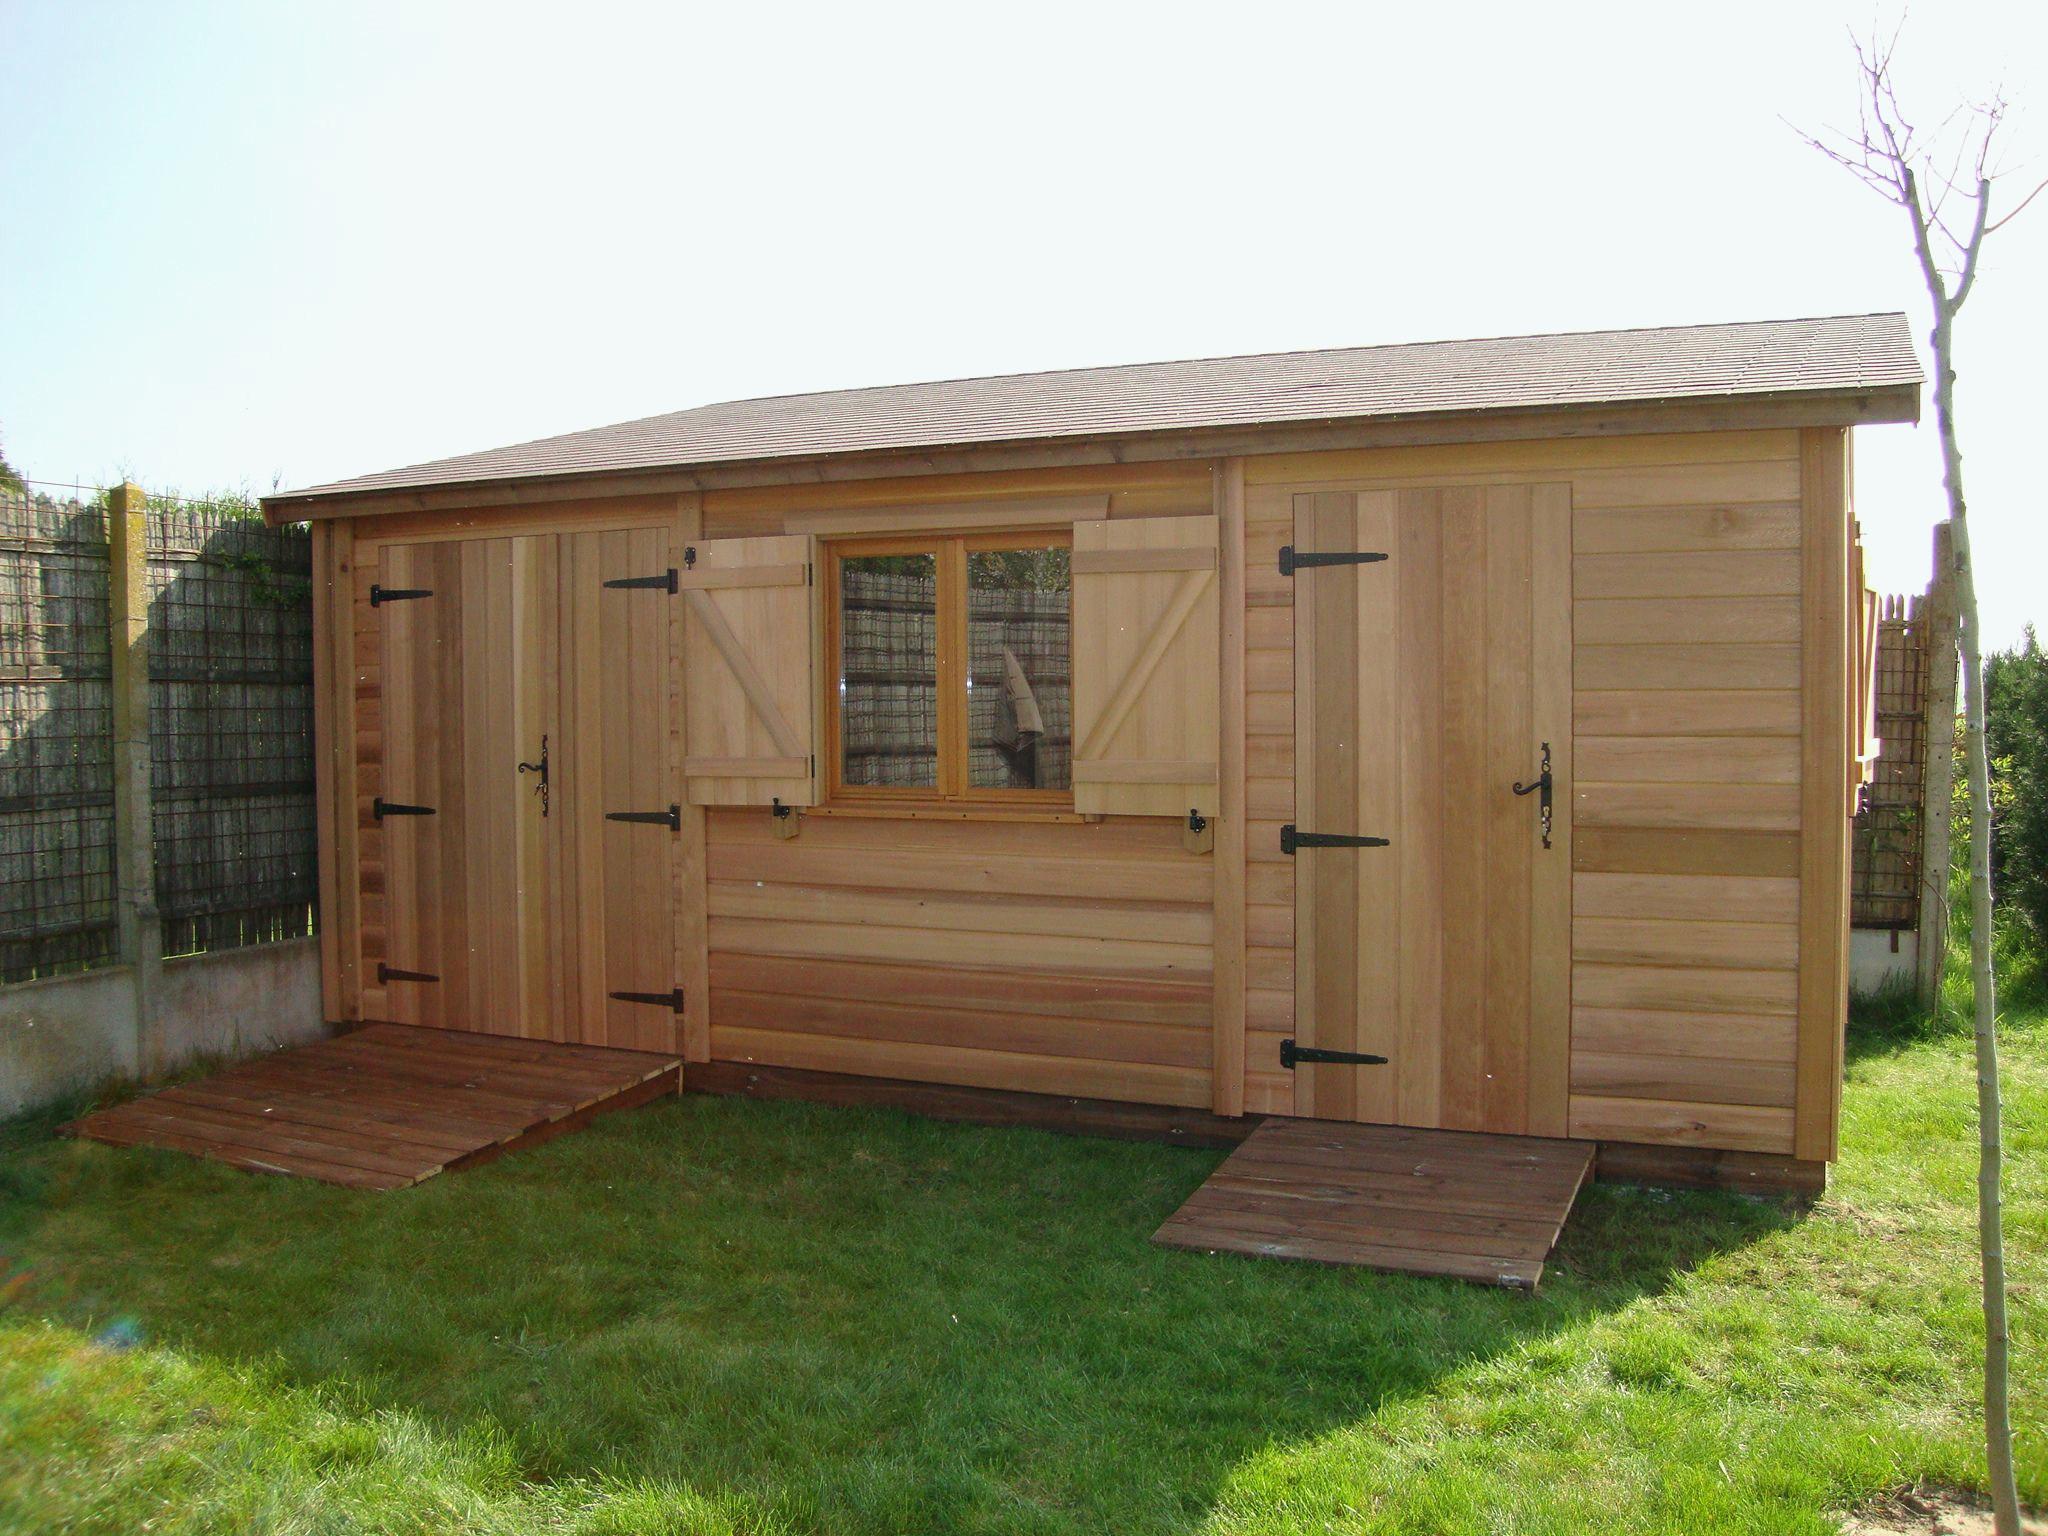 Idee Deco Interieur Cabane En Bois Beau Stock Abri Jardin Posite Idée Vers Le Habitation – Sullivanmaxx